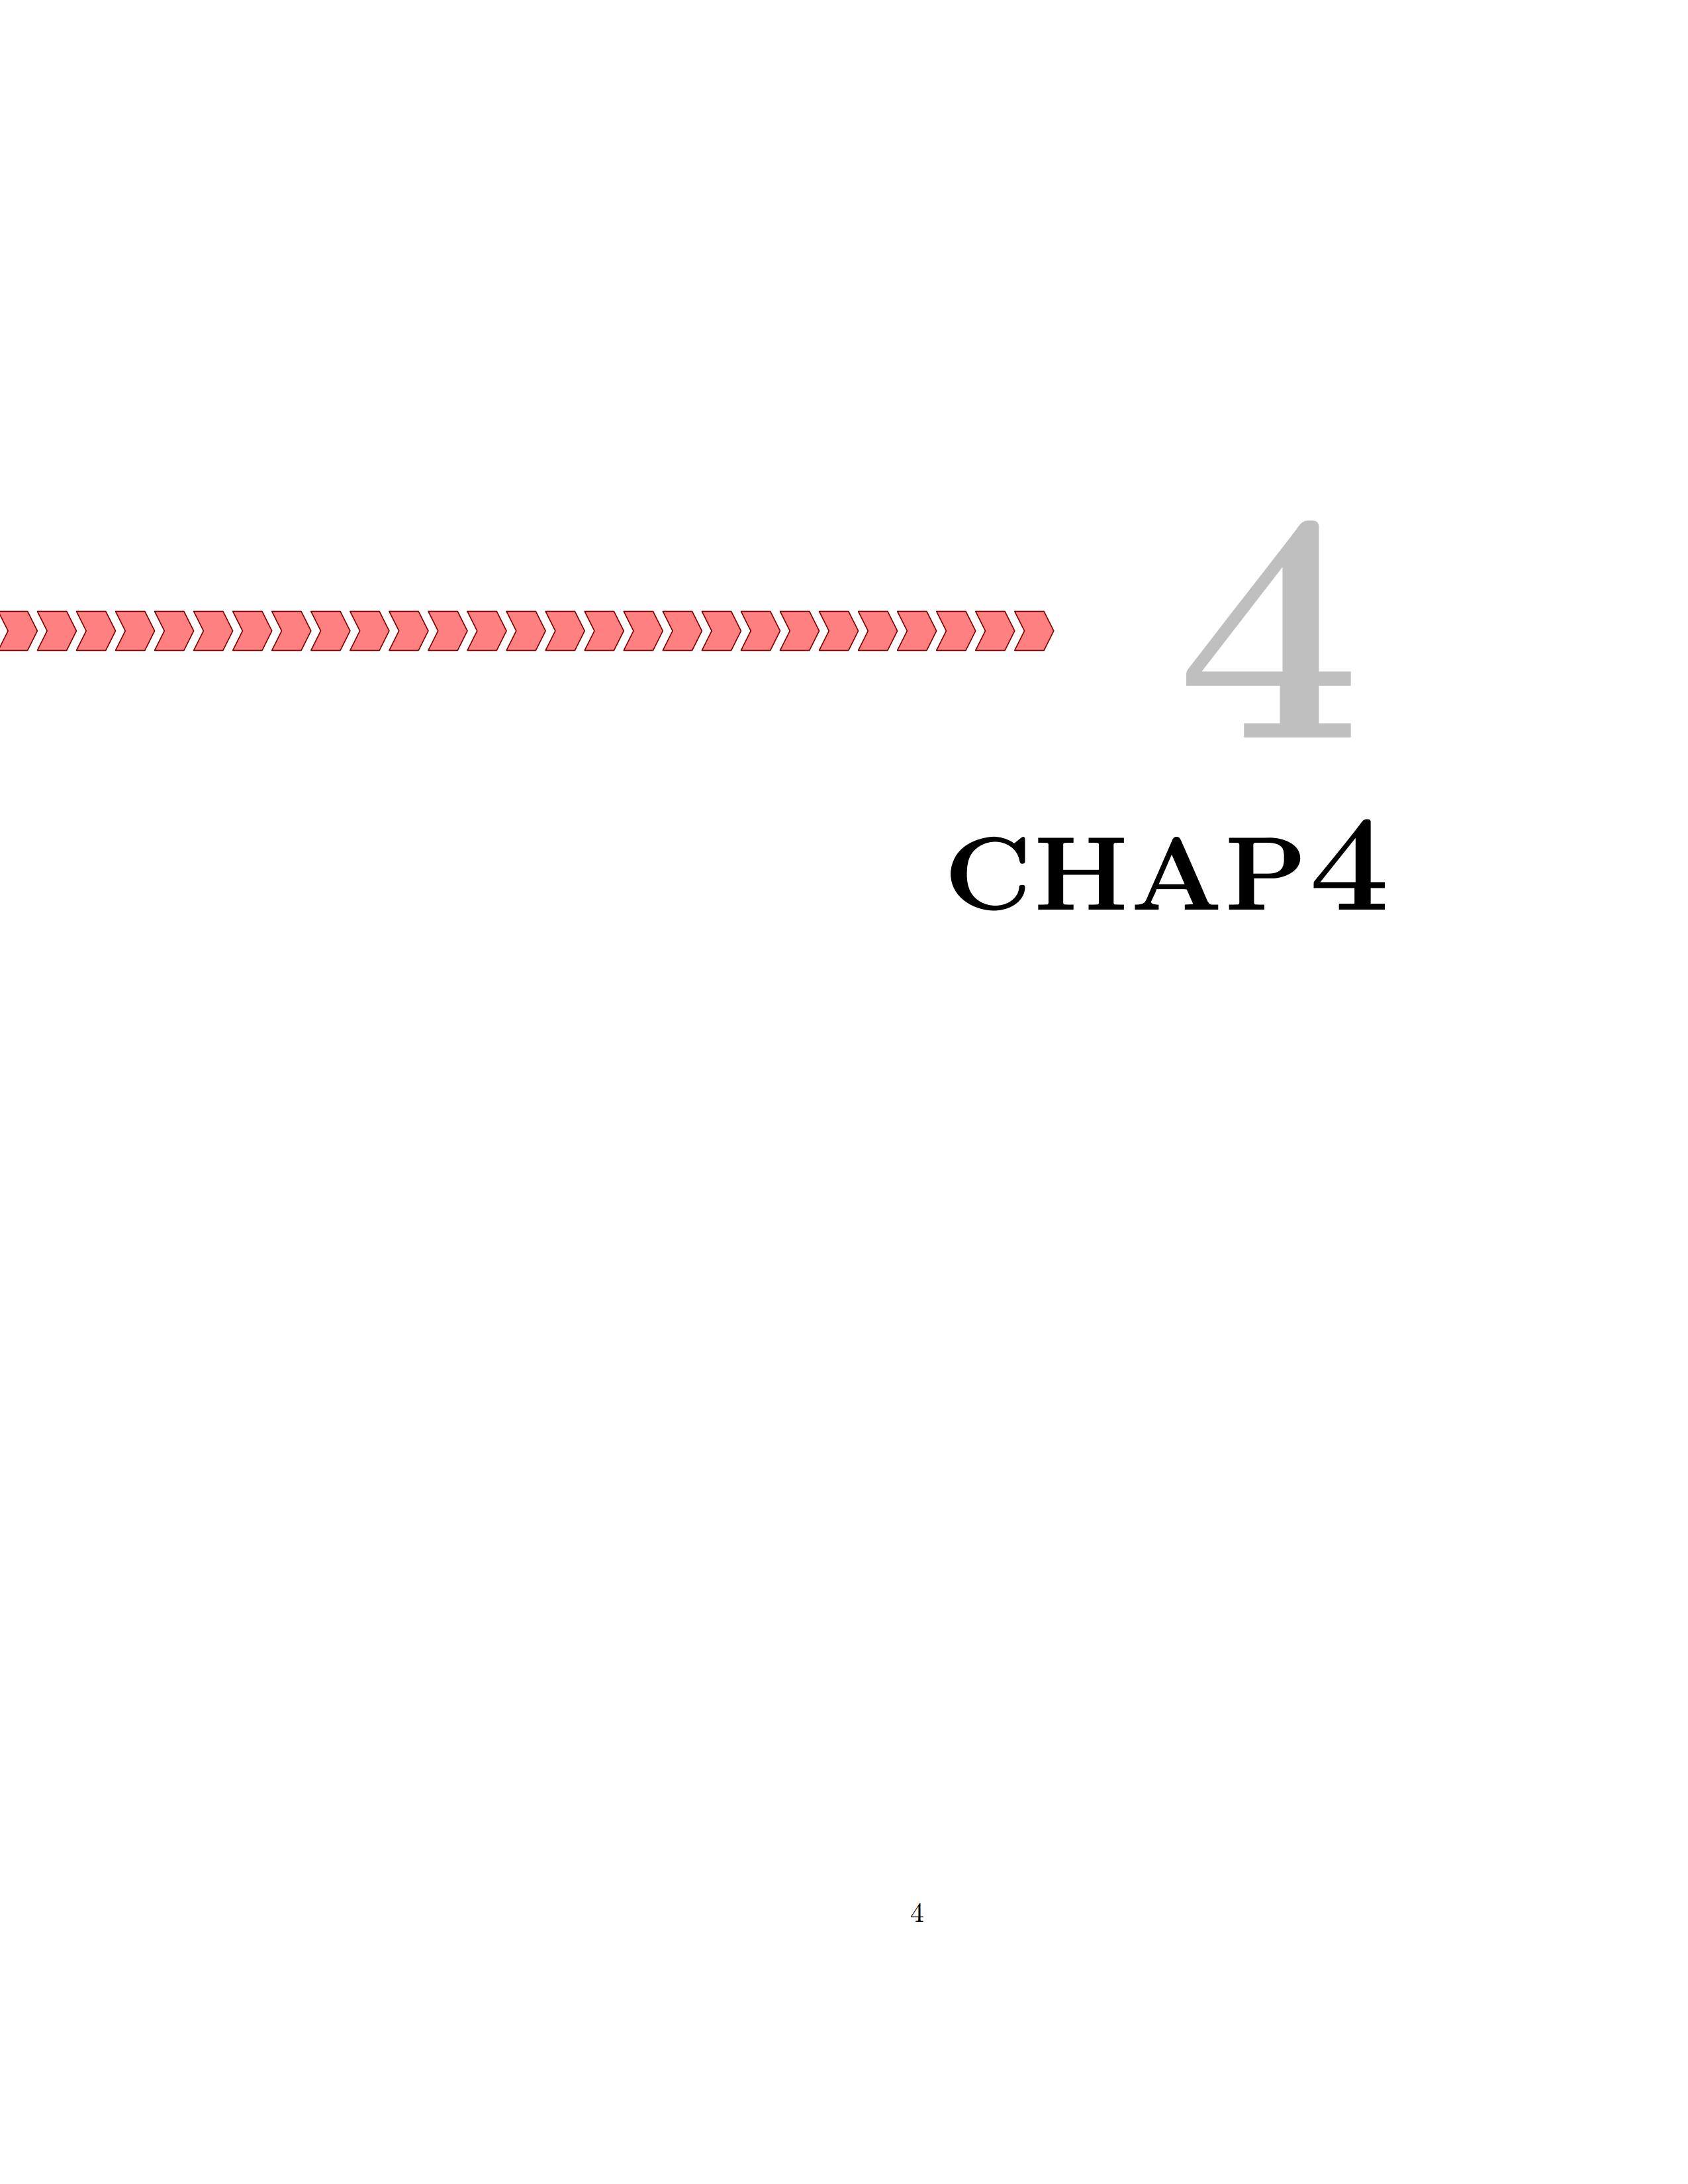 TikZ 定制的章节样式